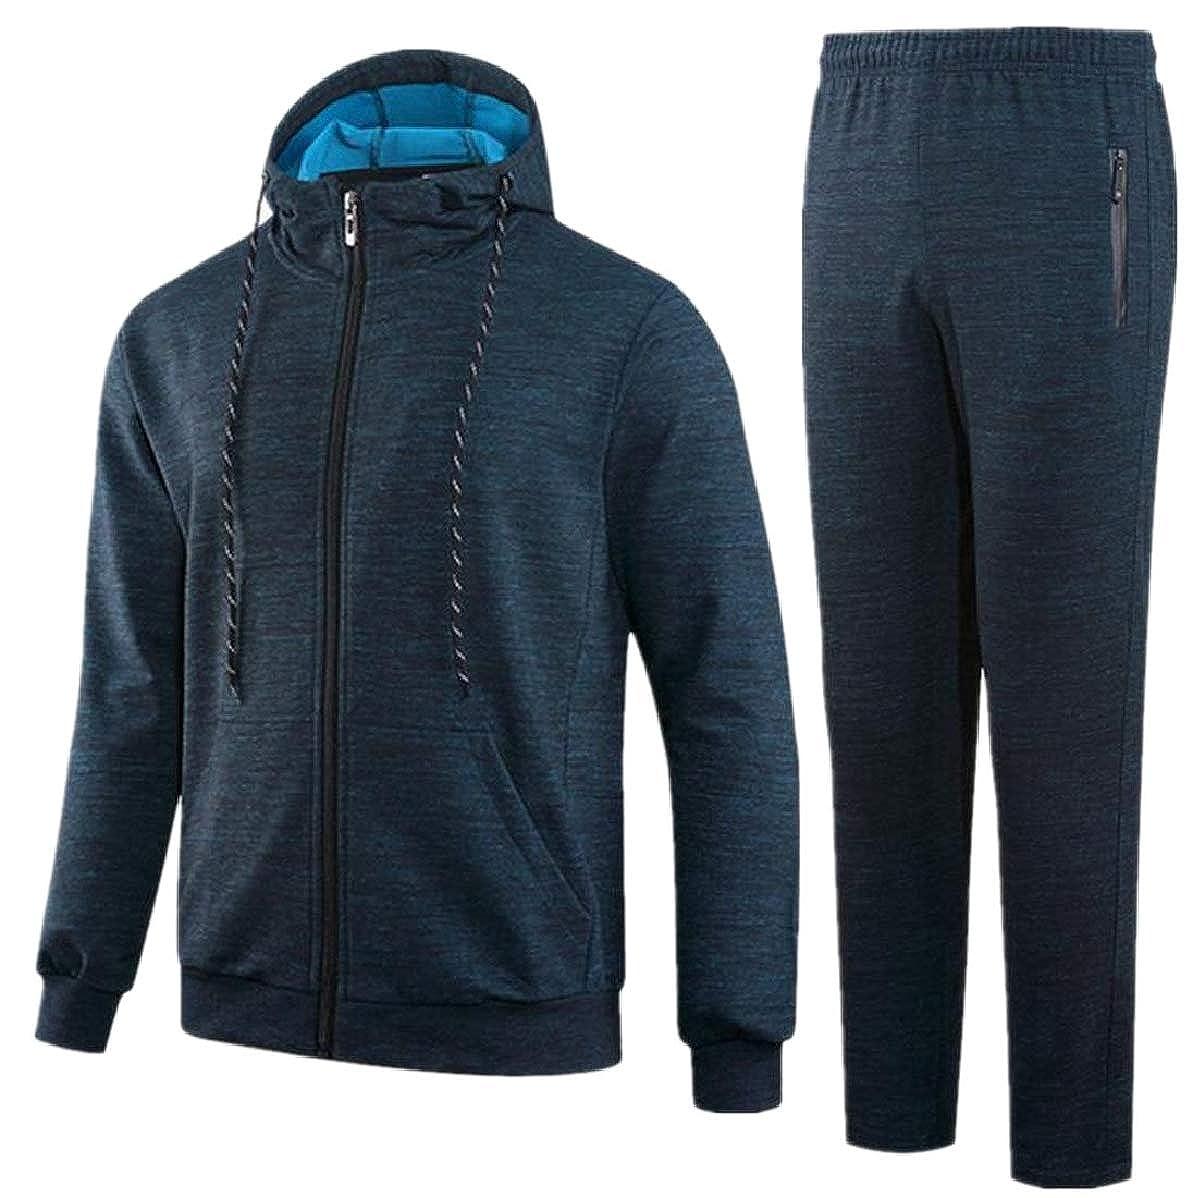 FLCH+YIGE Mens Drawstring Hoodie Casual Elastic Waist Pants Sweatshirt Tracksuit Set 3 XS